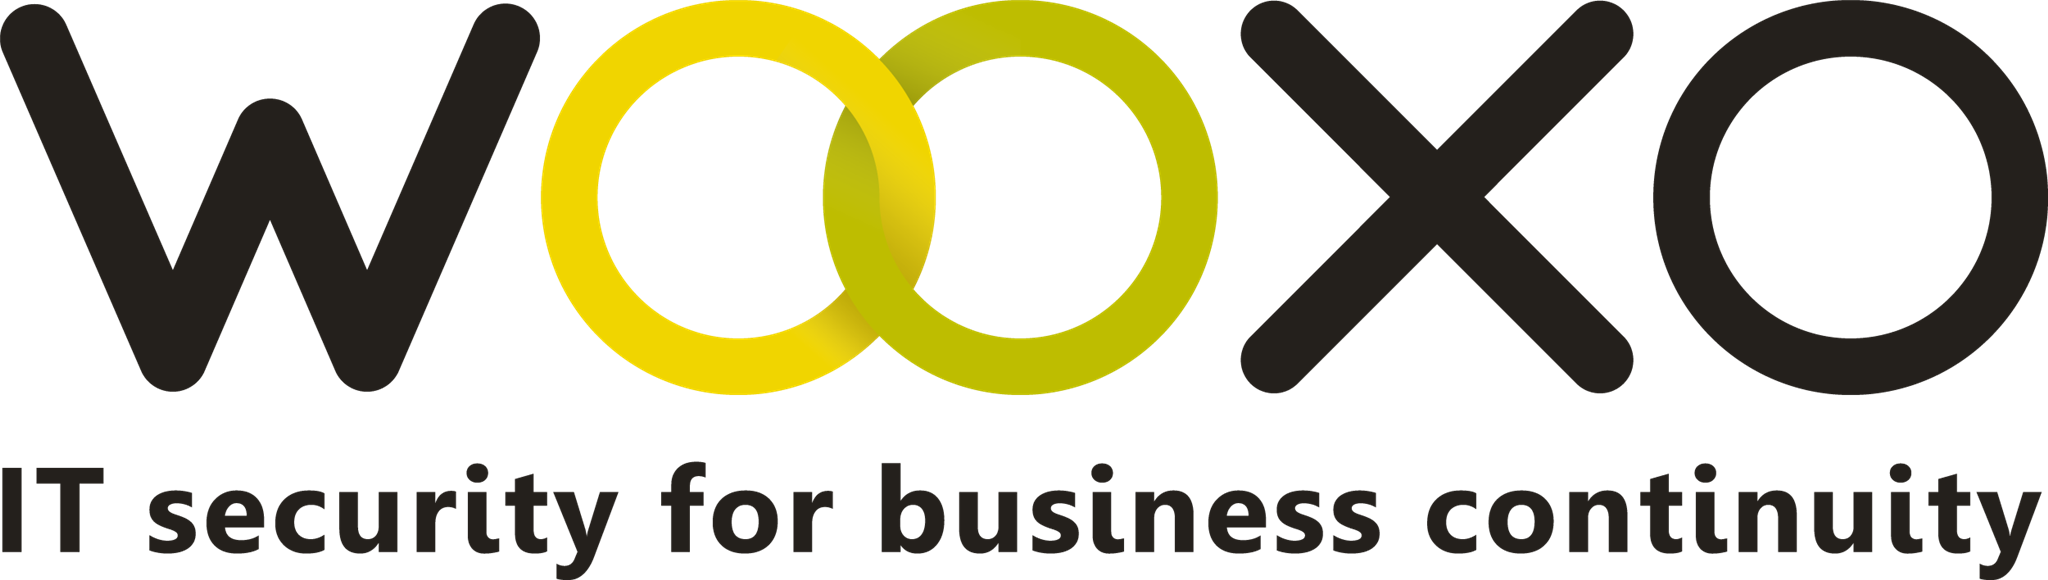 Logo-Wooxo---RVB